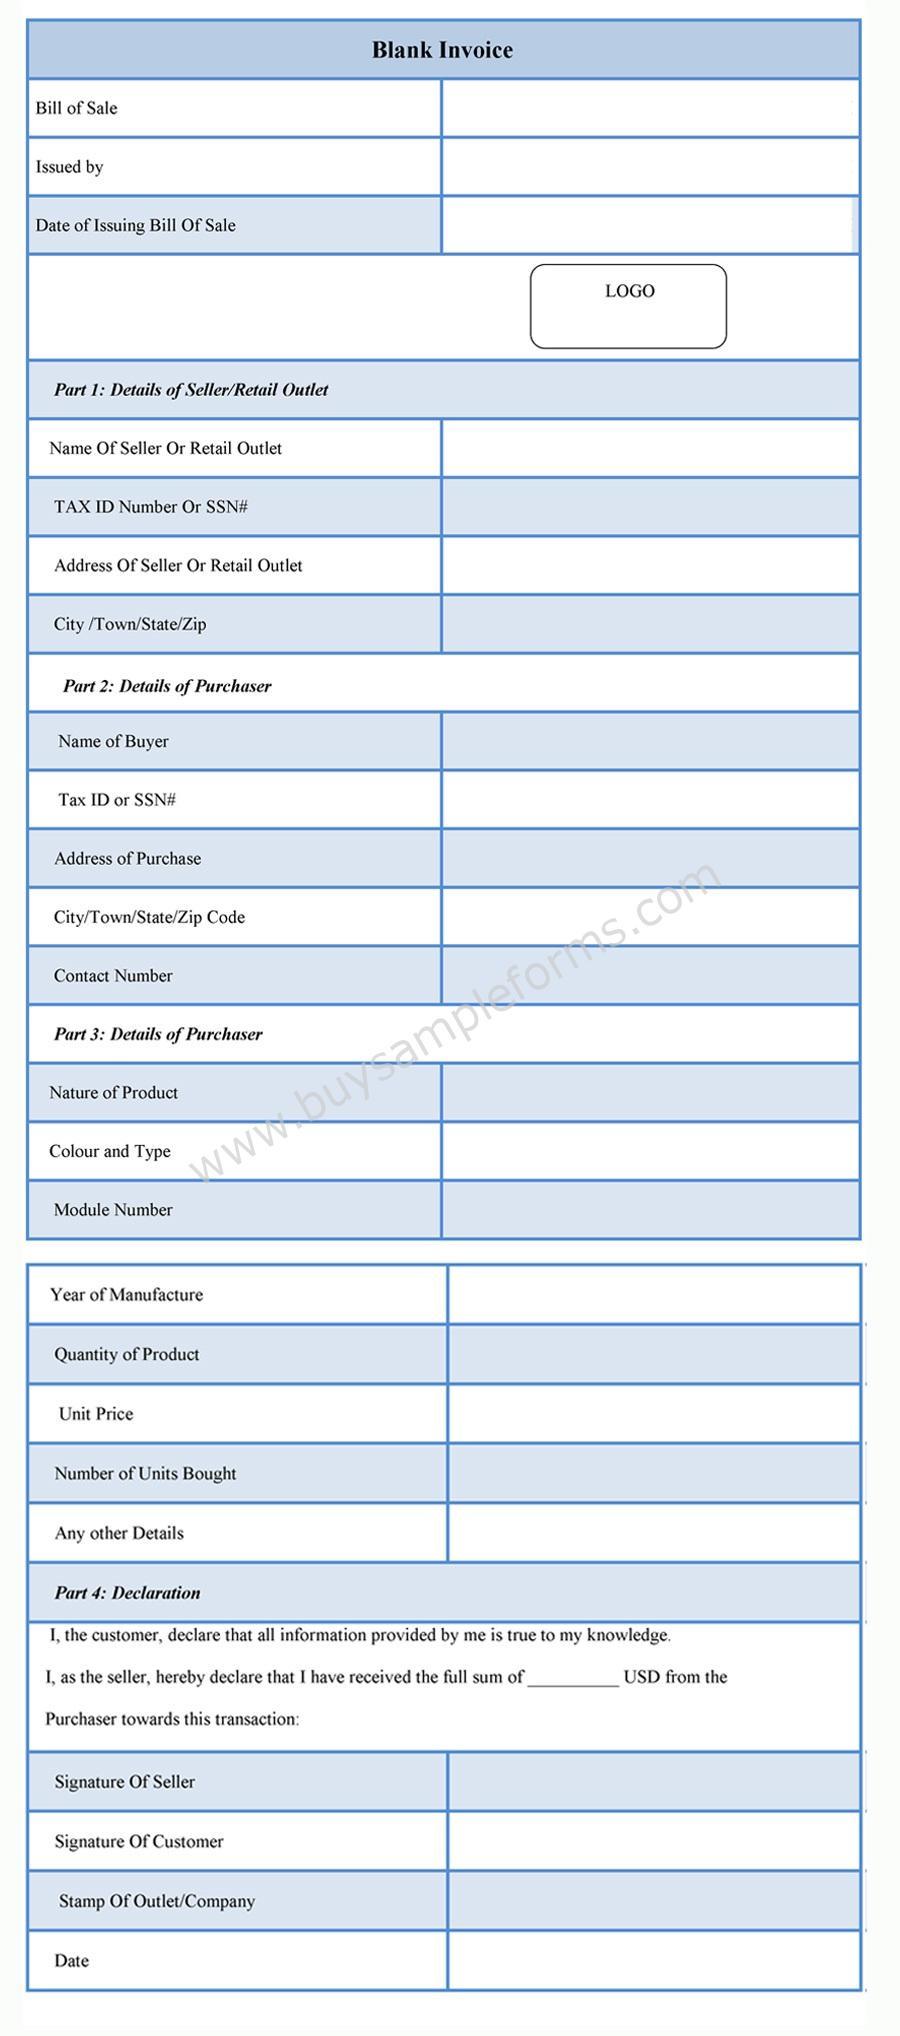 Blank Invoice Form sample